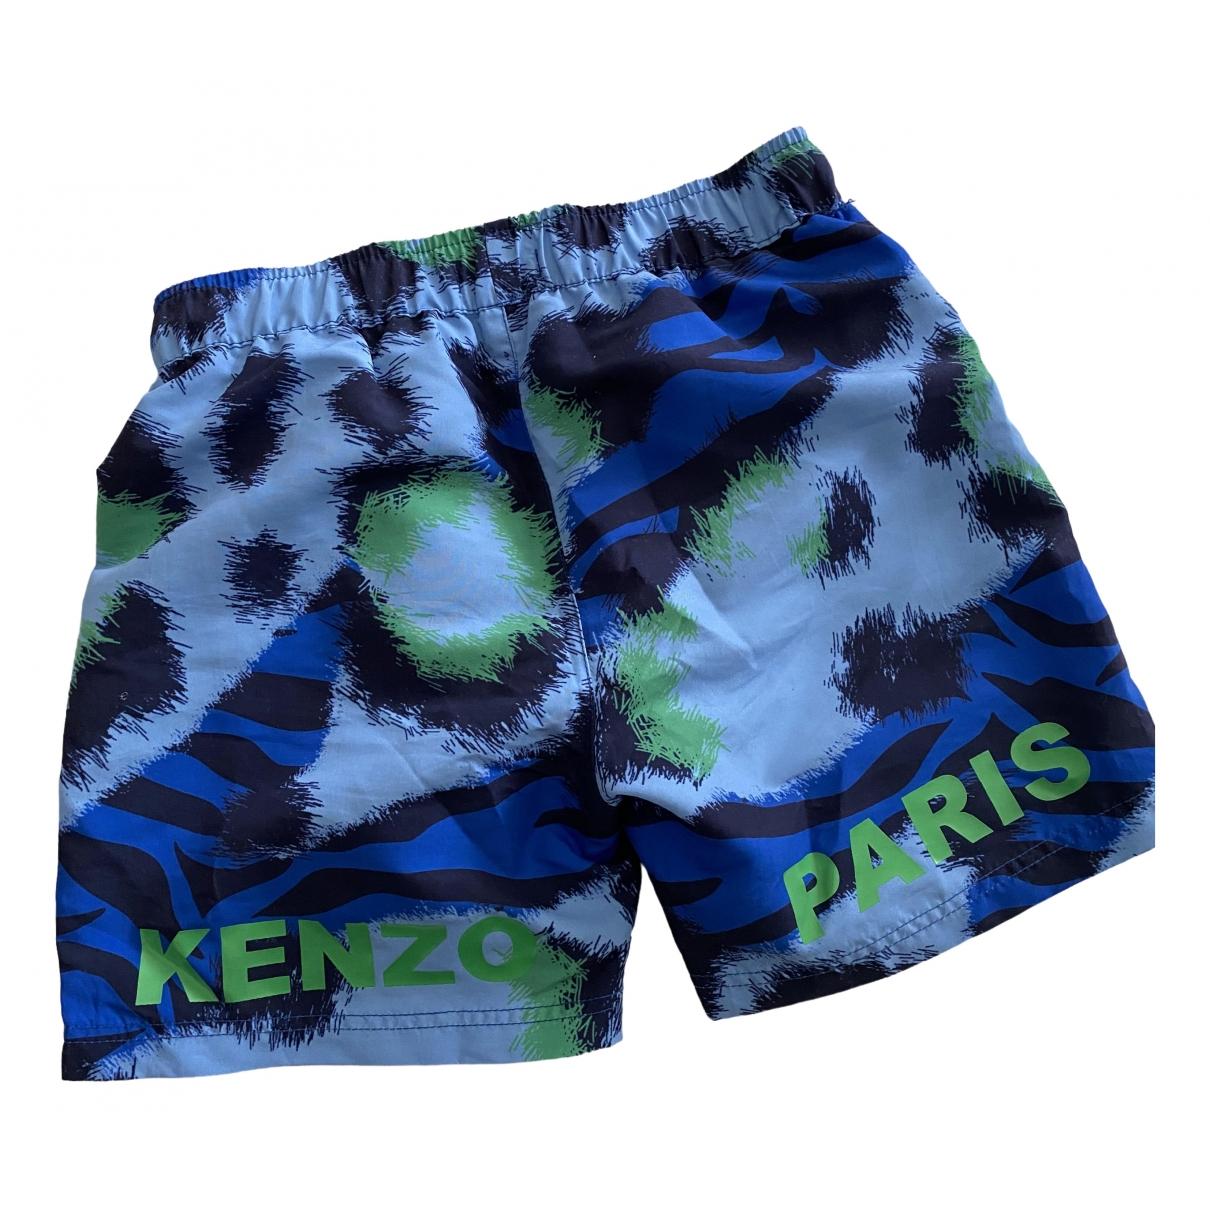 Kenzo \N Shorts in  Blau Polyester